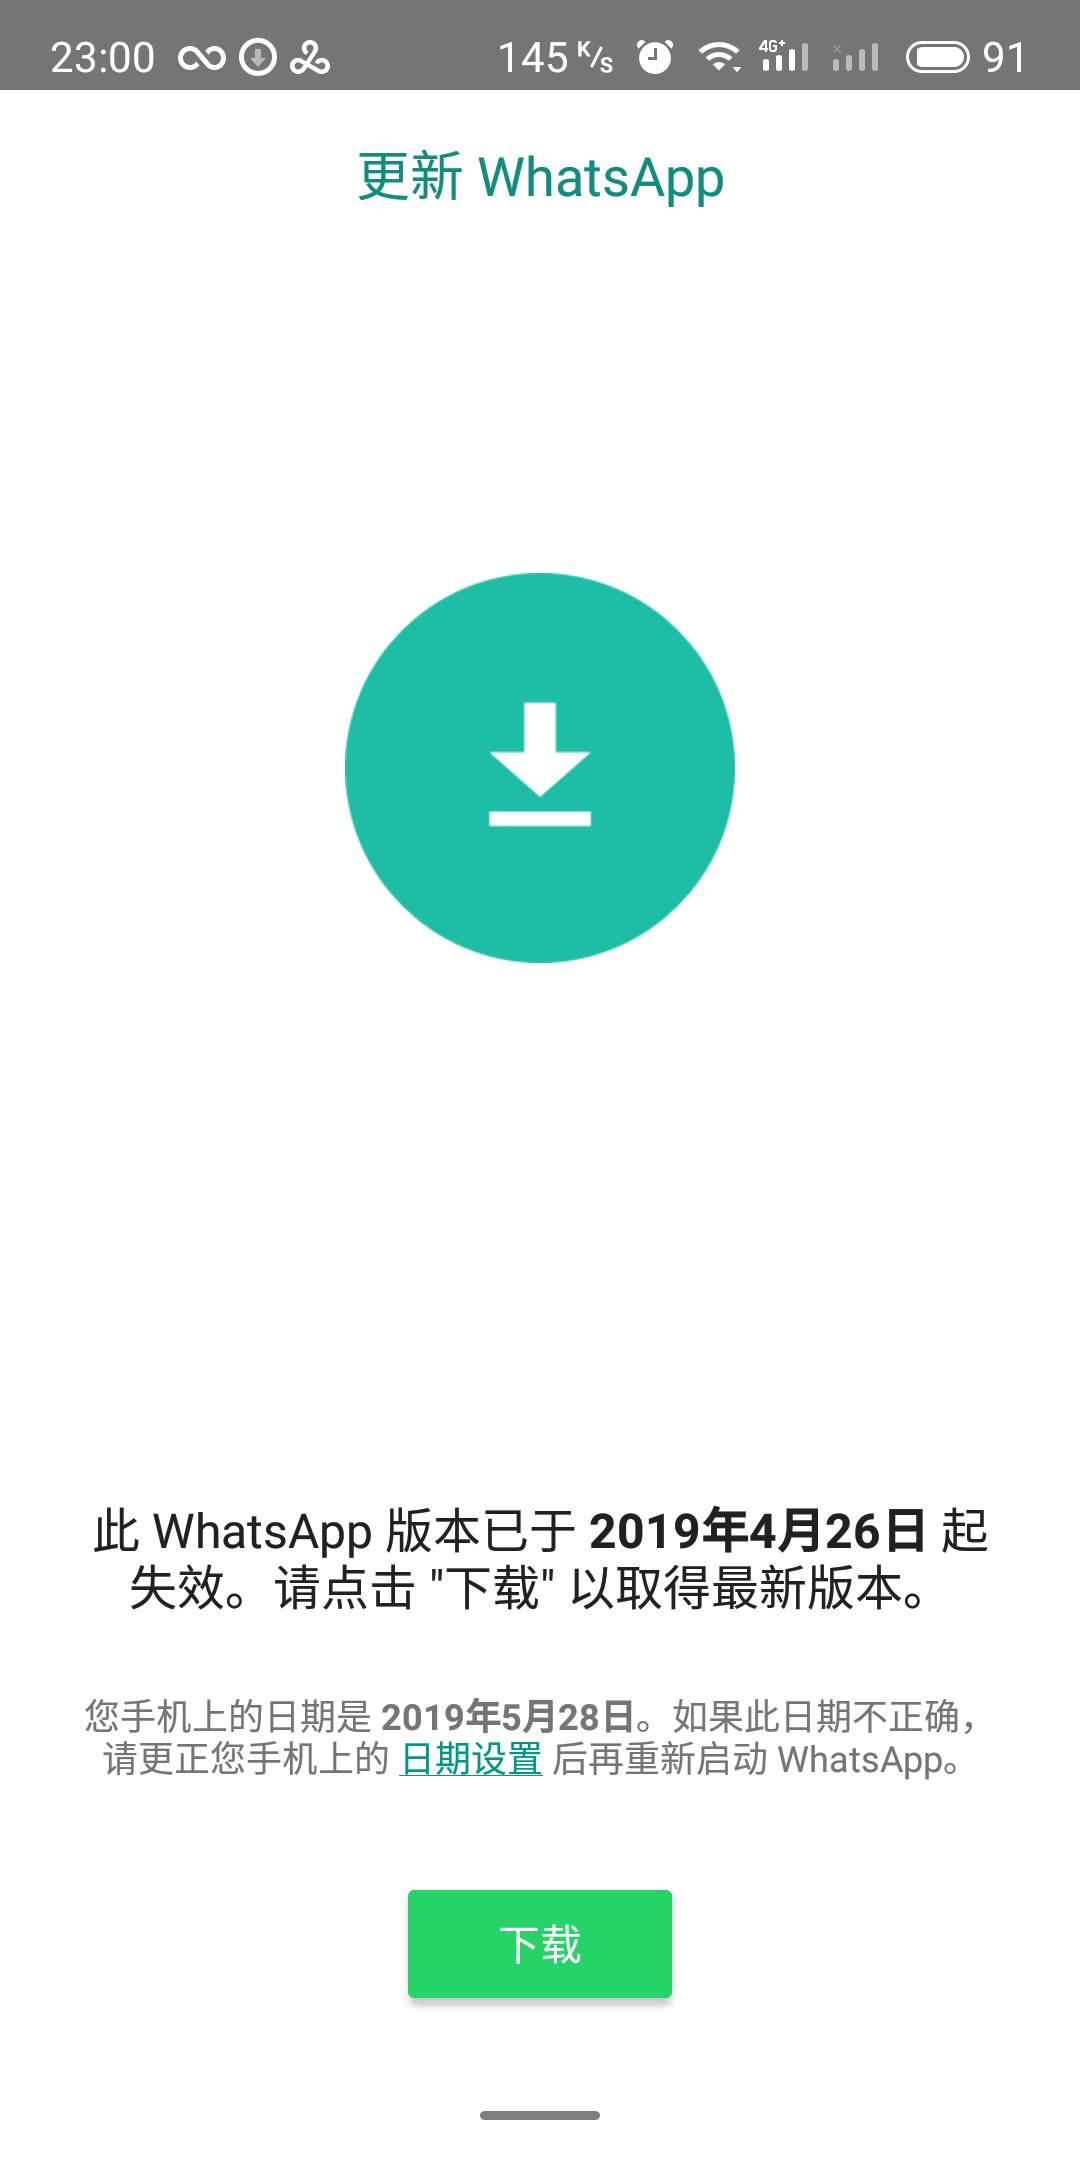 whatsapp设置头像_whatsapp最新版下载whatsapp时间不对日期不正确whatsapp怎么安装_软件 ...